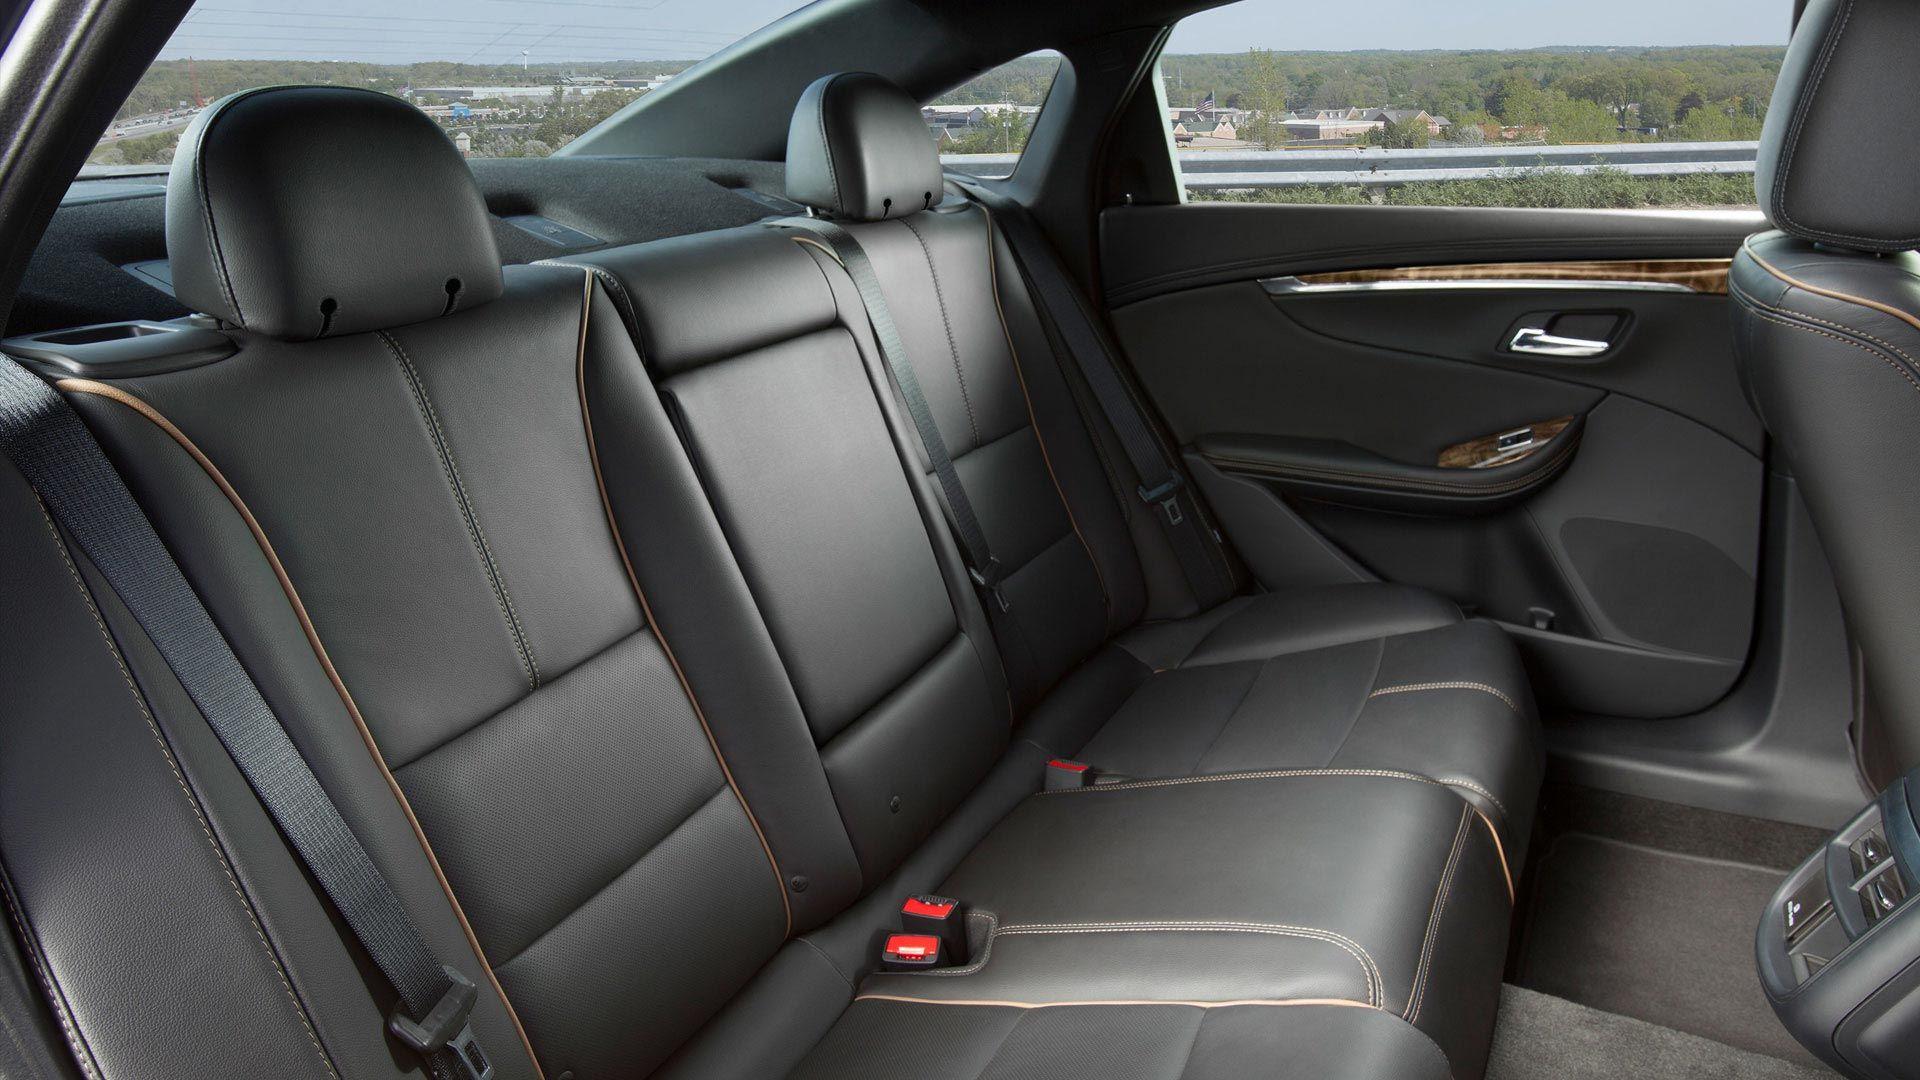 2016 Impala Ltz Full Size Cars Rear Seats Impala 2014 Chevy